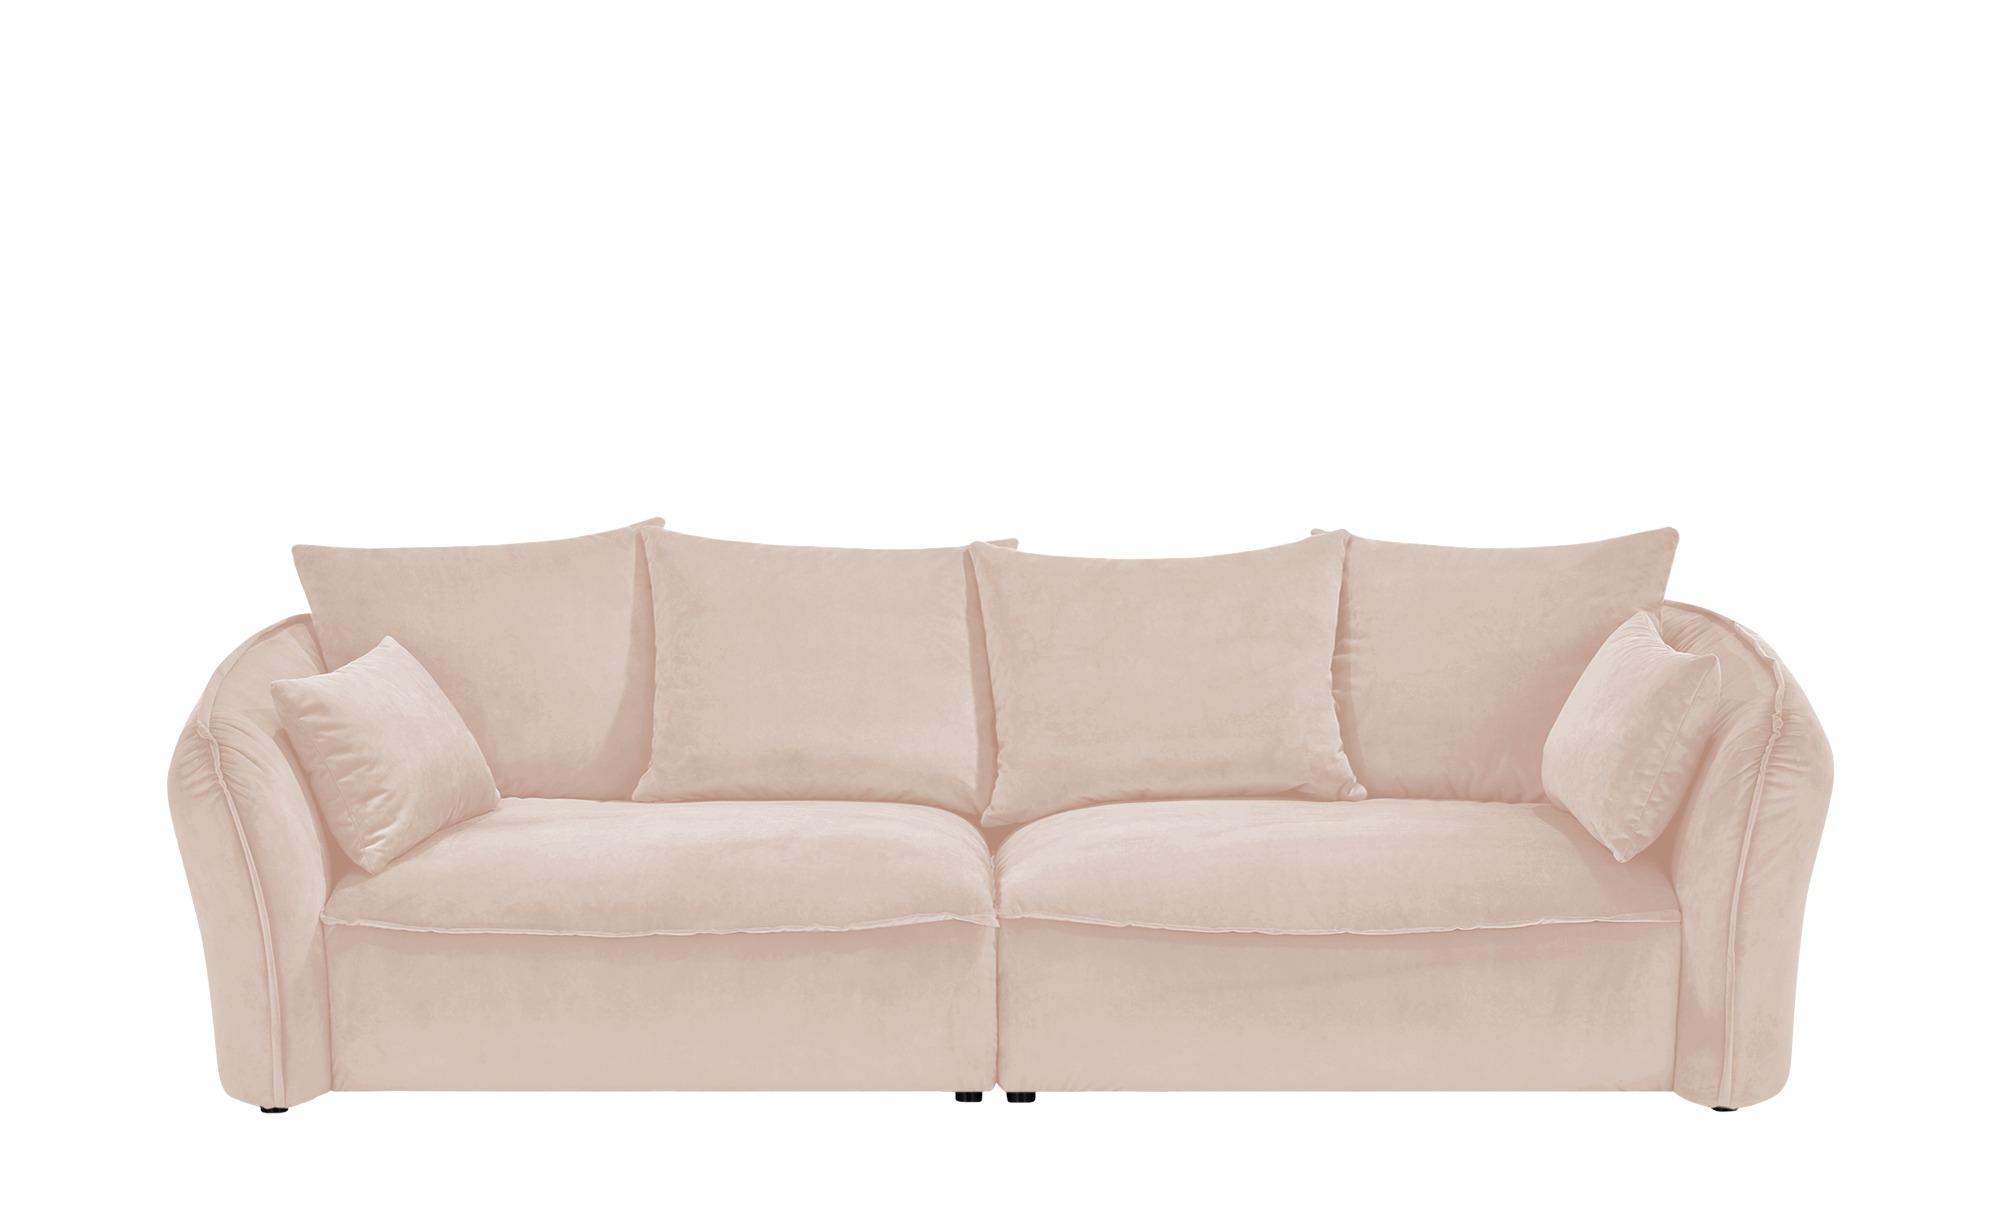 Megasofa  Yale ¦ rosa/pink ¦ Maße (cm): B: 280 H: 75 T: 118 Polstermöbel > Sofas > Einzelsofas - Höffner